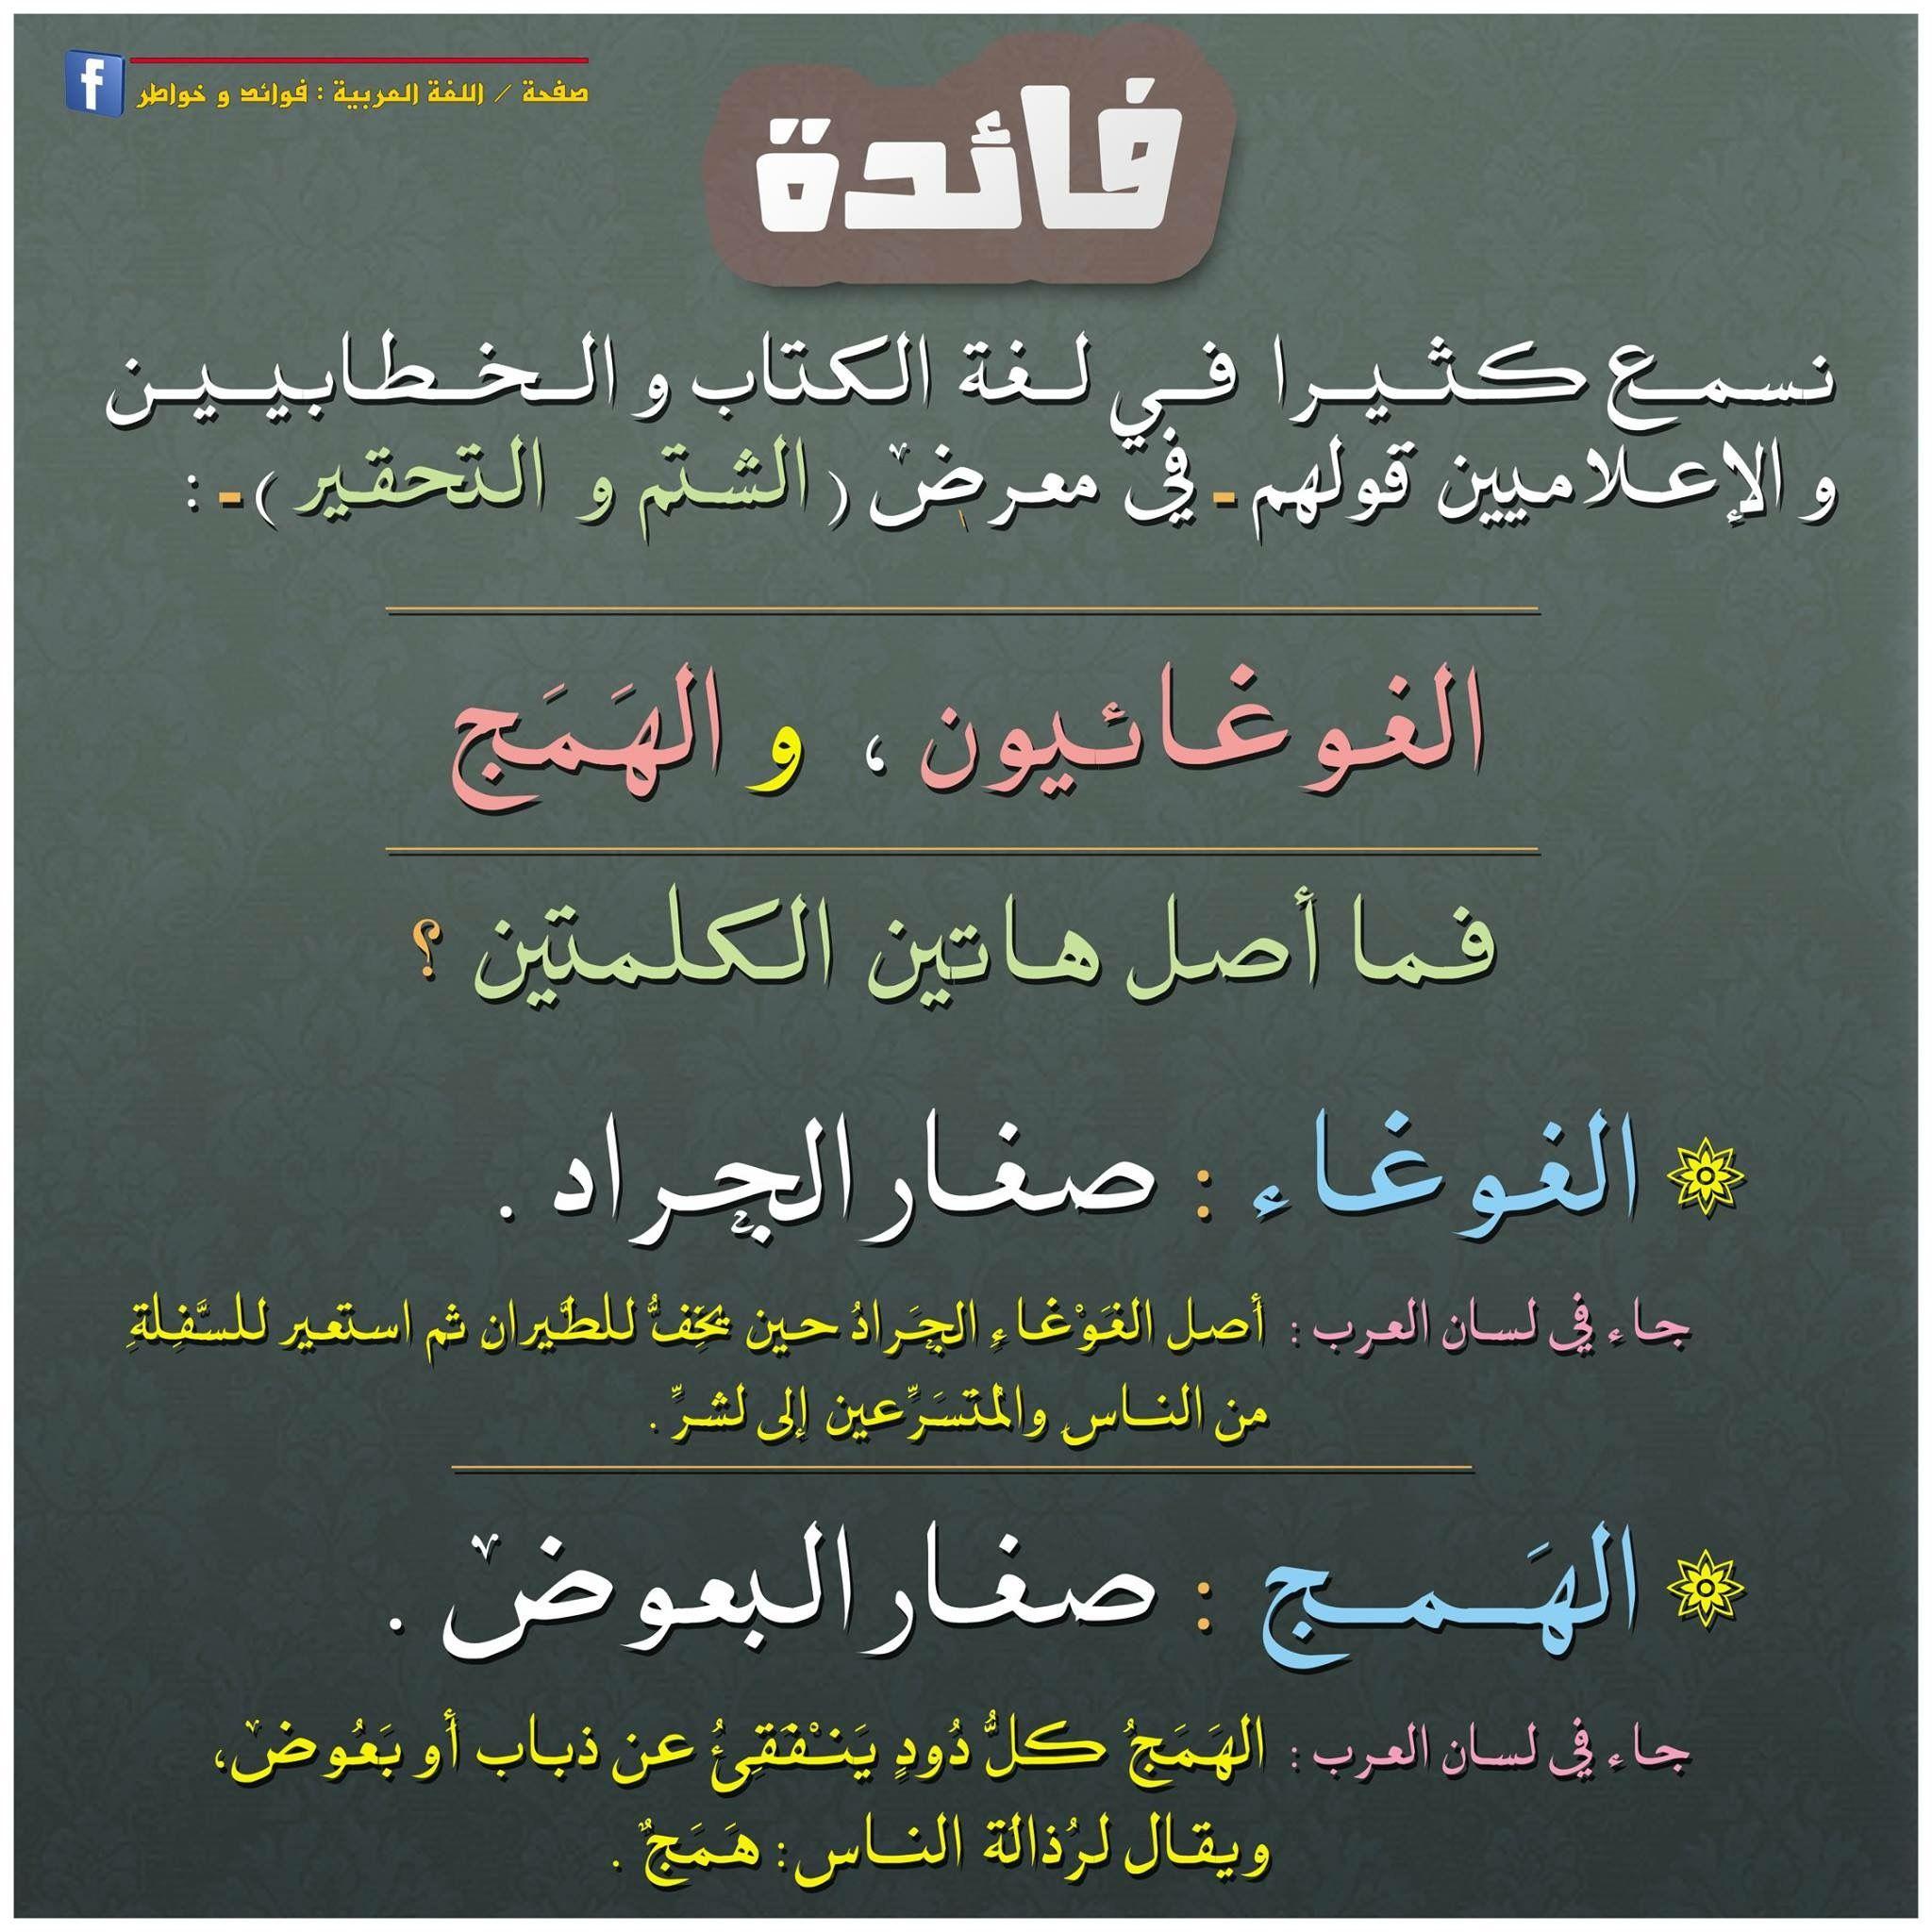 الغوغاء والهمج Learn Arabic Language Words Arabic Language